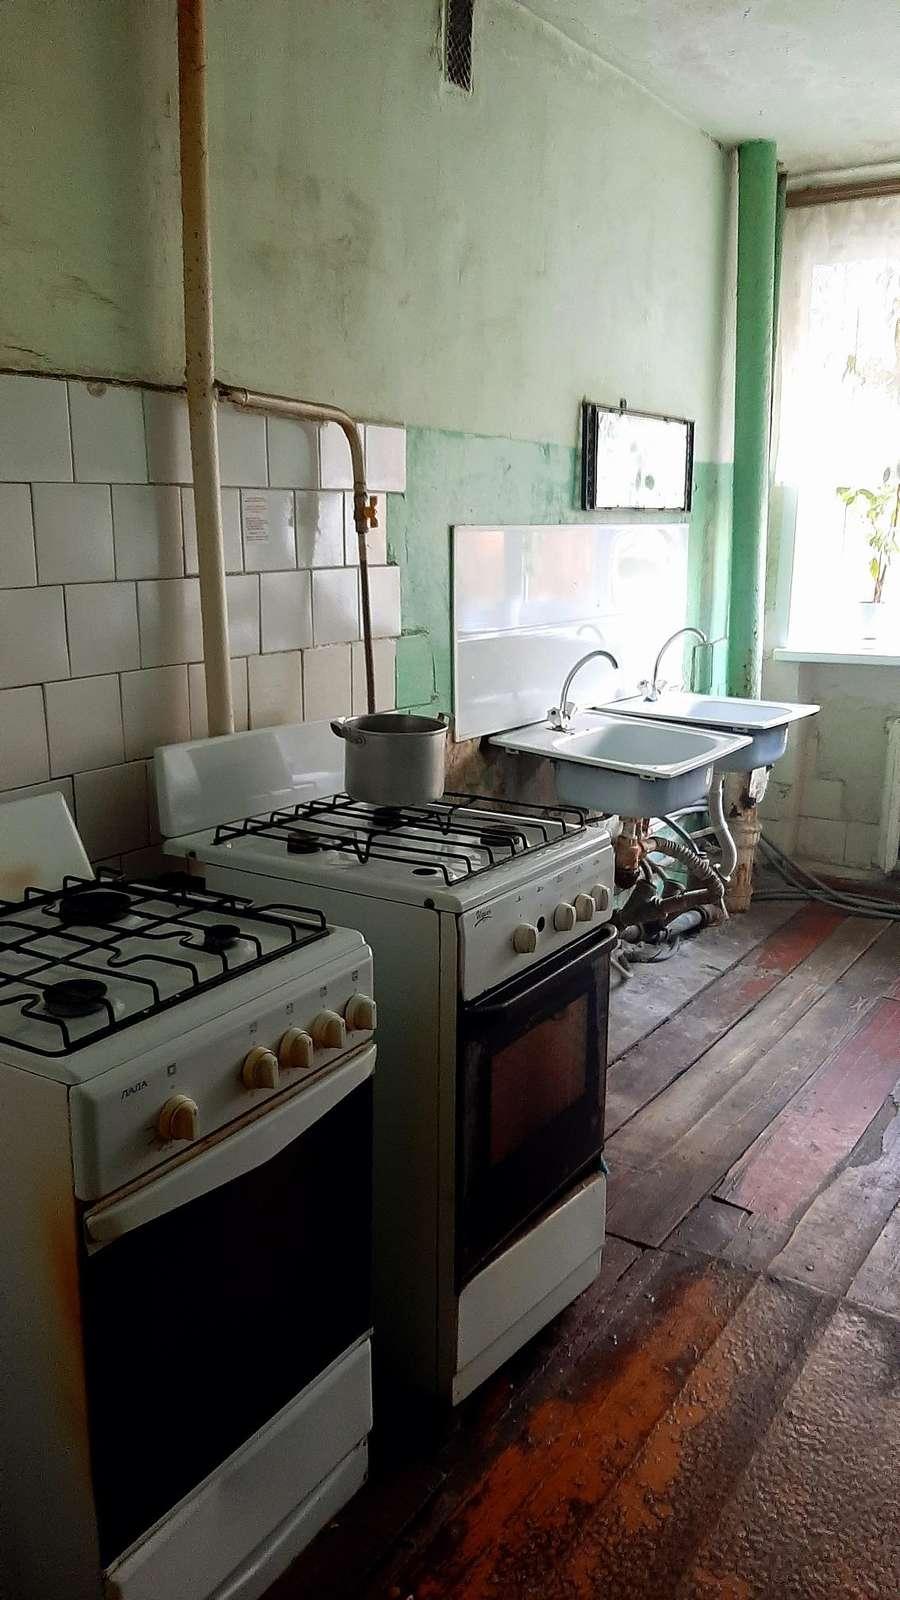 Продажа 1-комнатной квартиры, Самара, Александра Матросова улица,  дом 76а